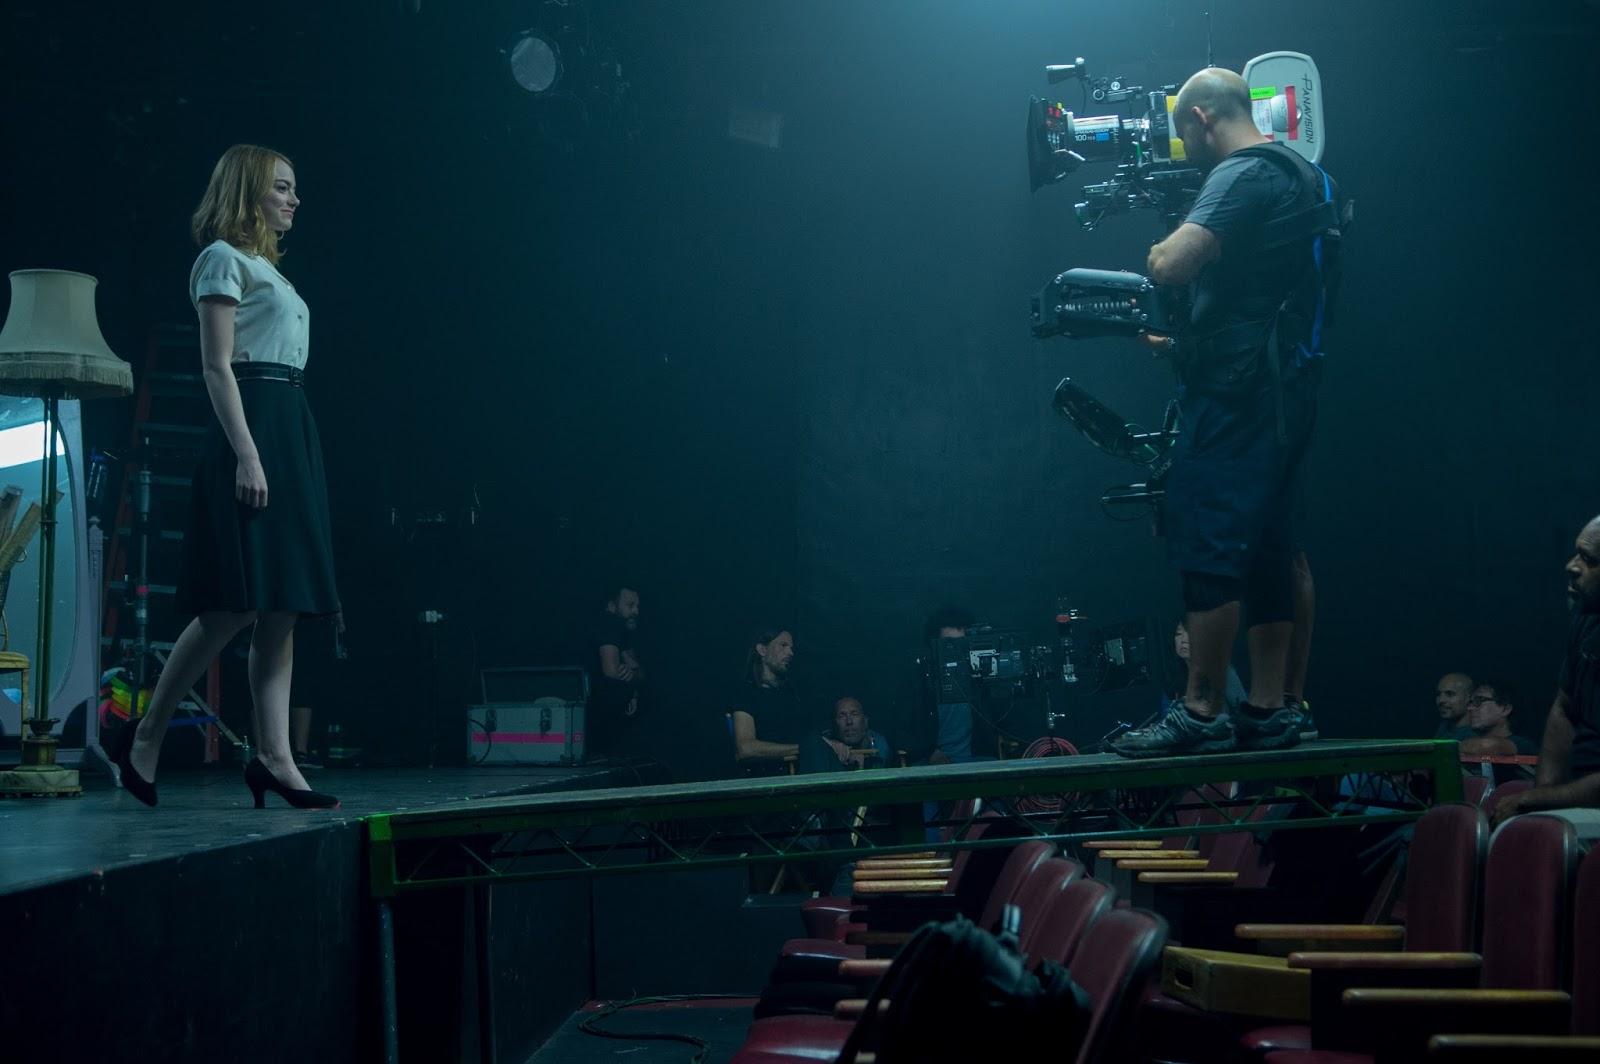 Emma Stone filmando película - LaLaLand